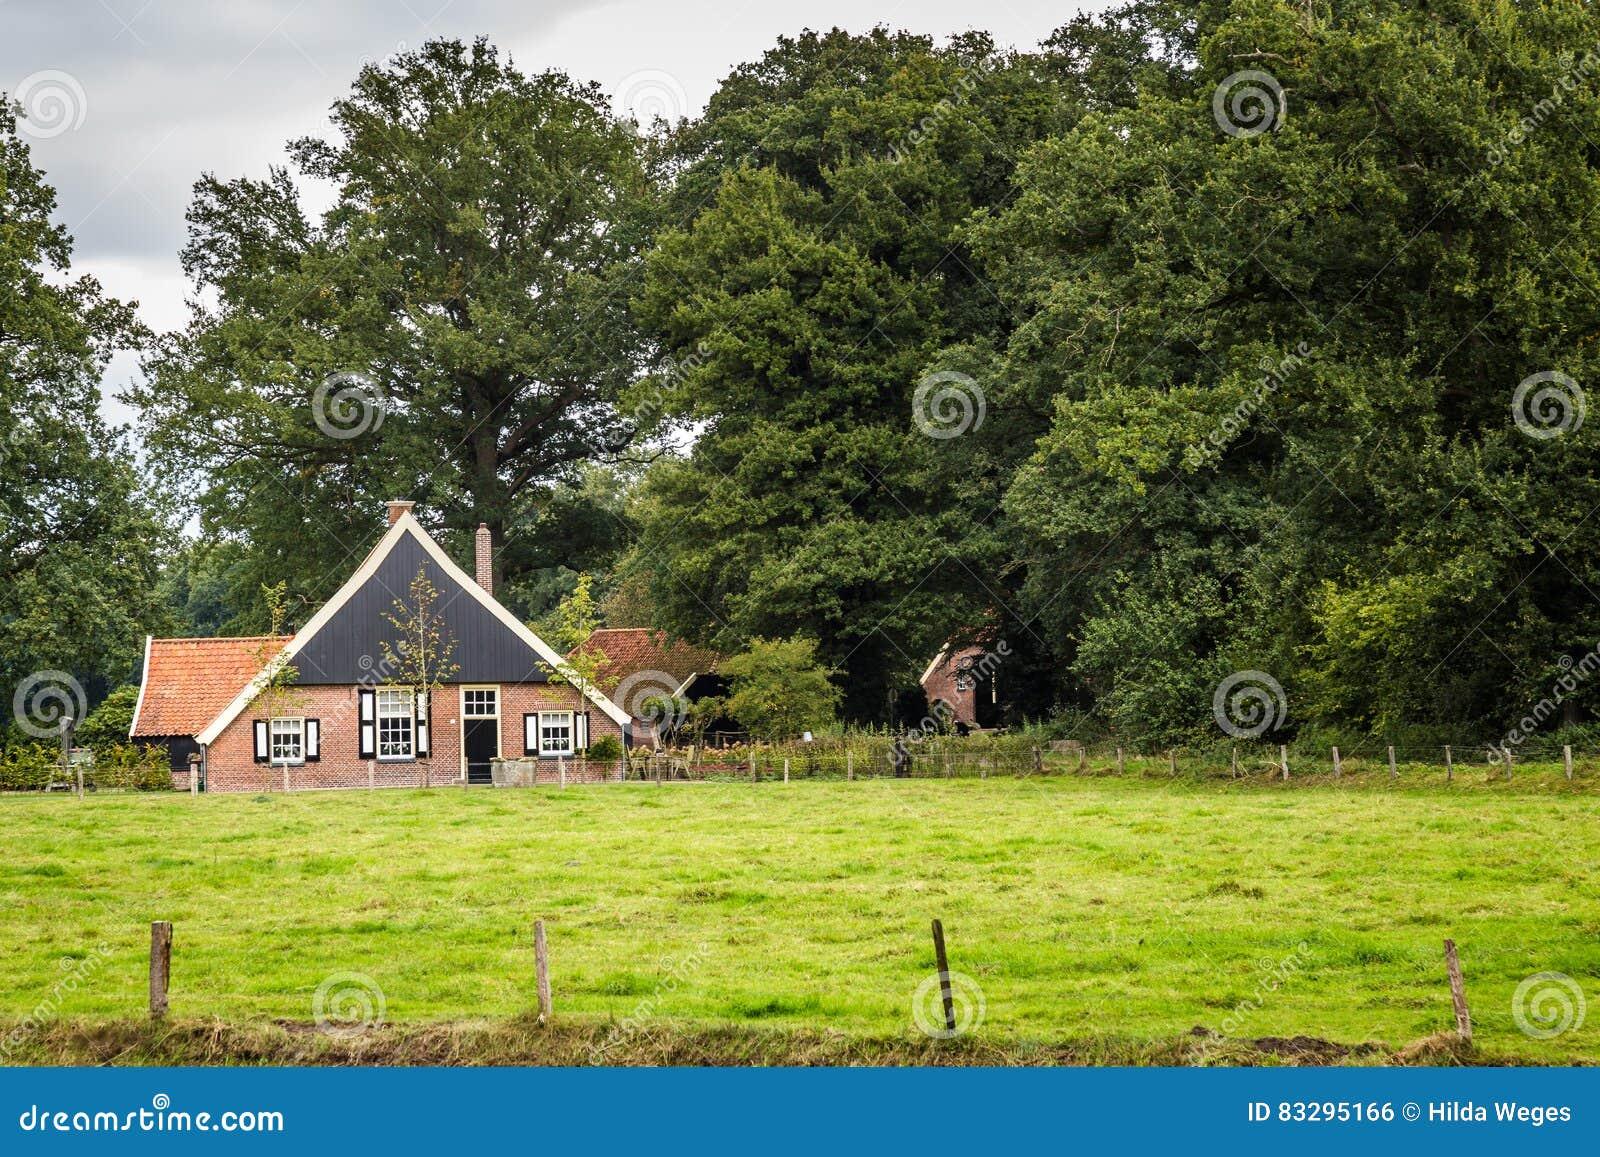 Old Dutch Farmhouse Royalty Free Stock Image